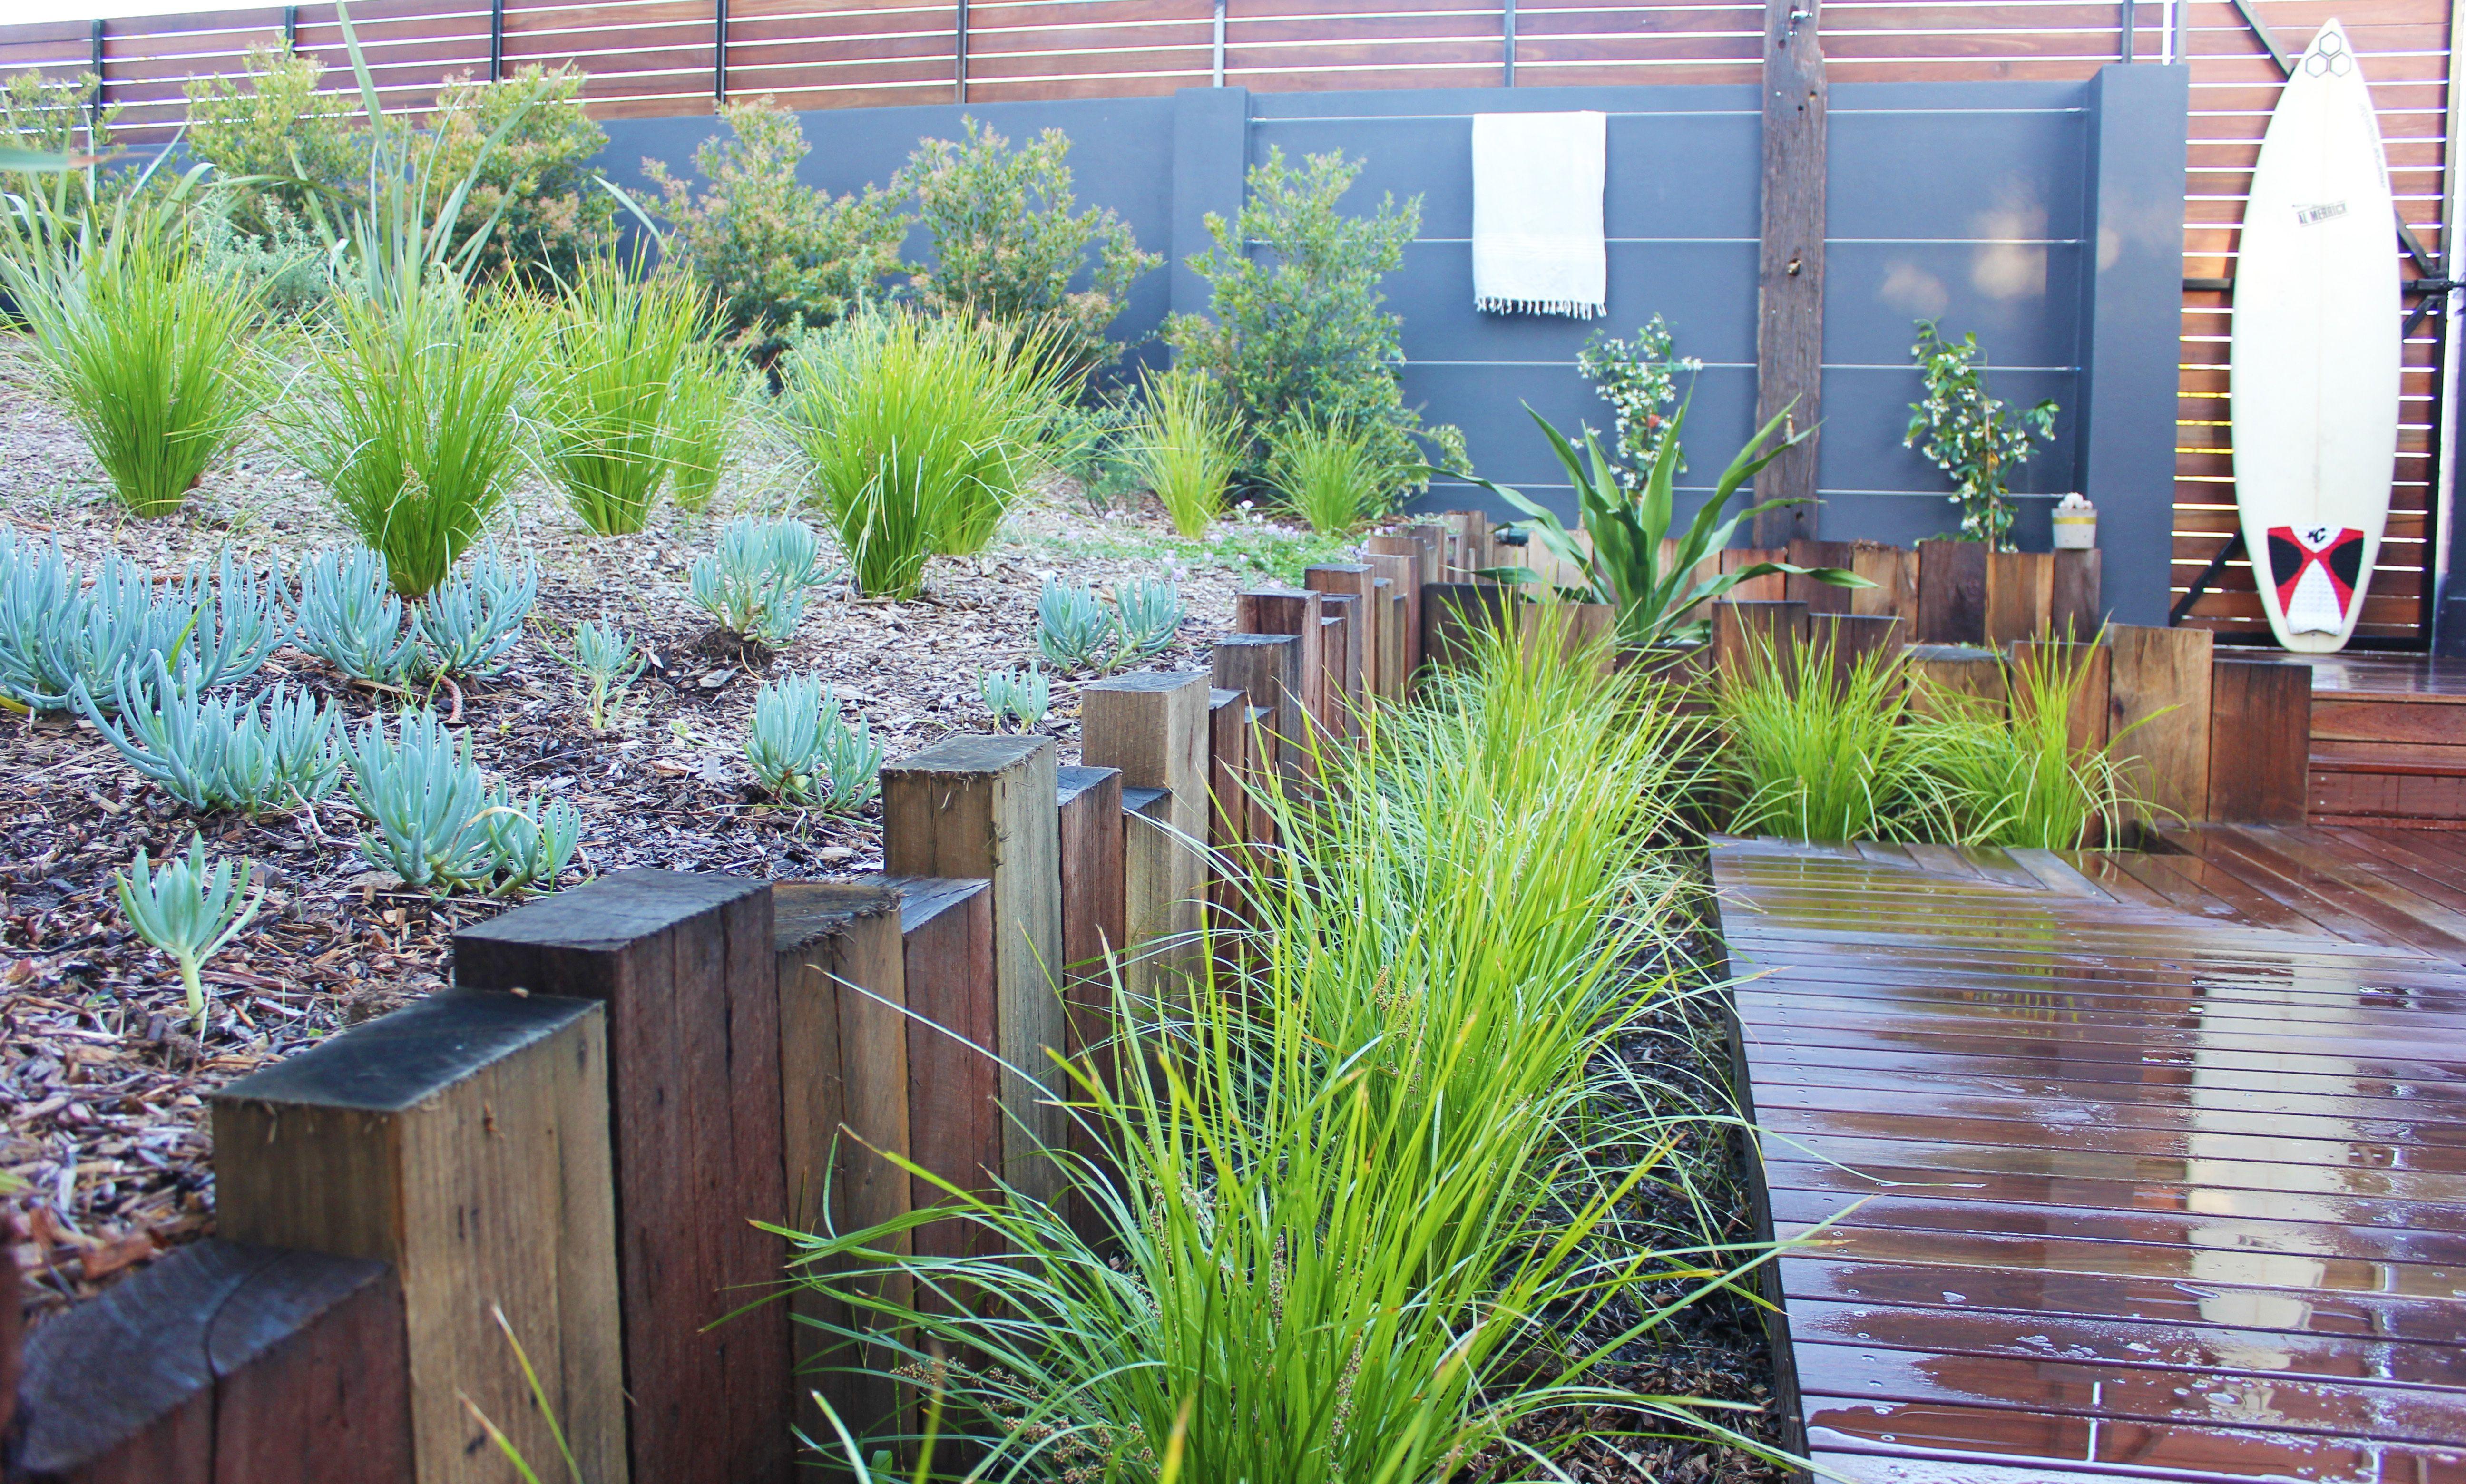 Newport Garden, Landscape, Landscape Design, Outdoor Shower, Garden, Beach  Side,